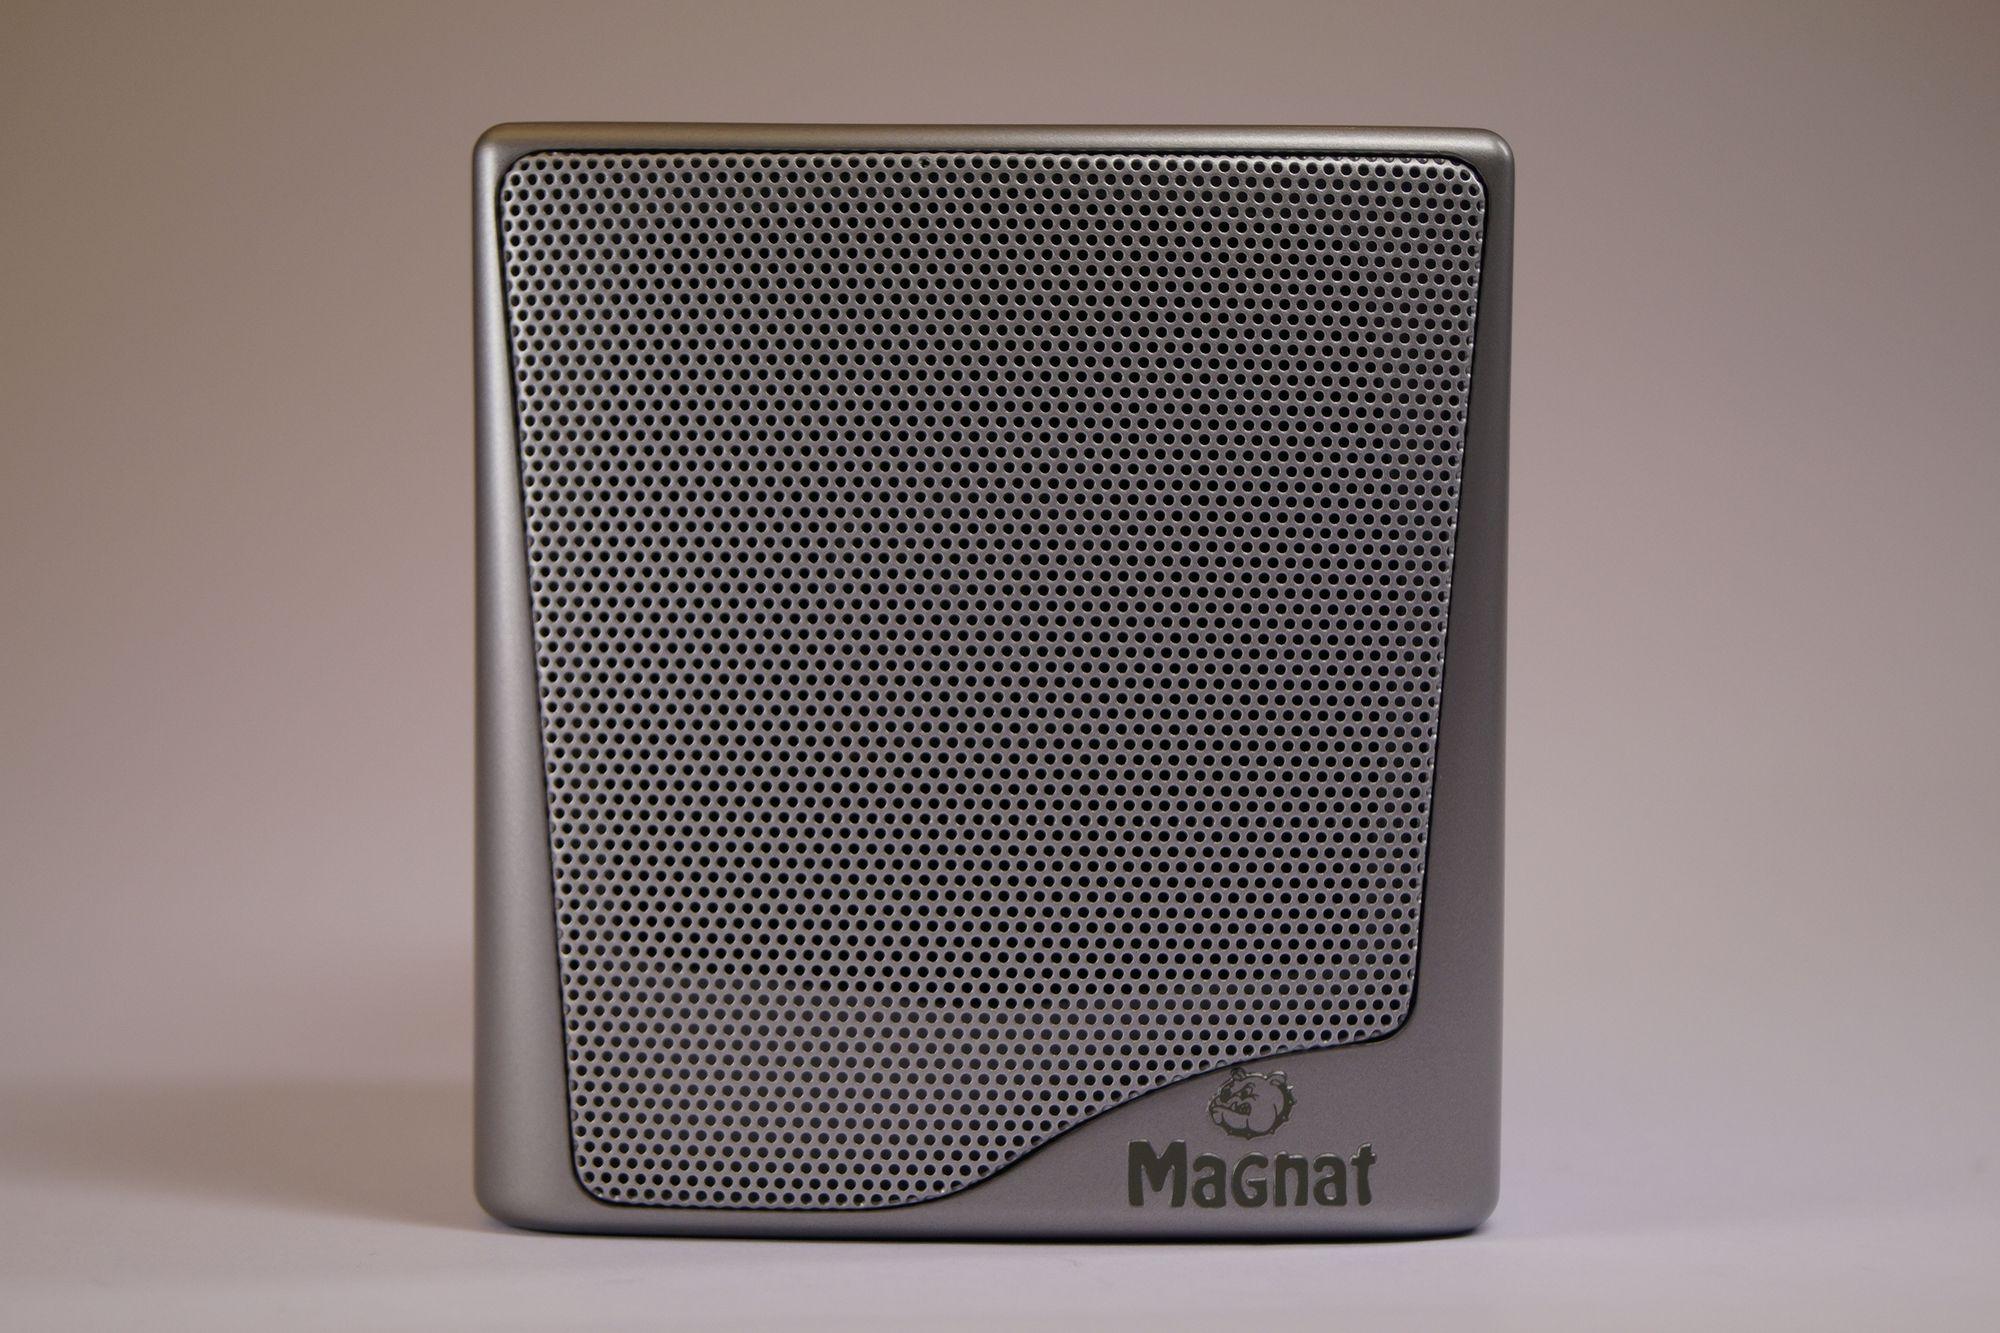 Magnat Cubus 5.1 Front Lautsprecher Satellite silber,1 Paar – Bild 2